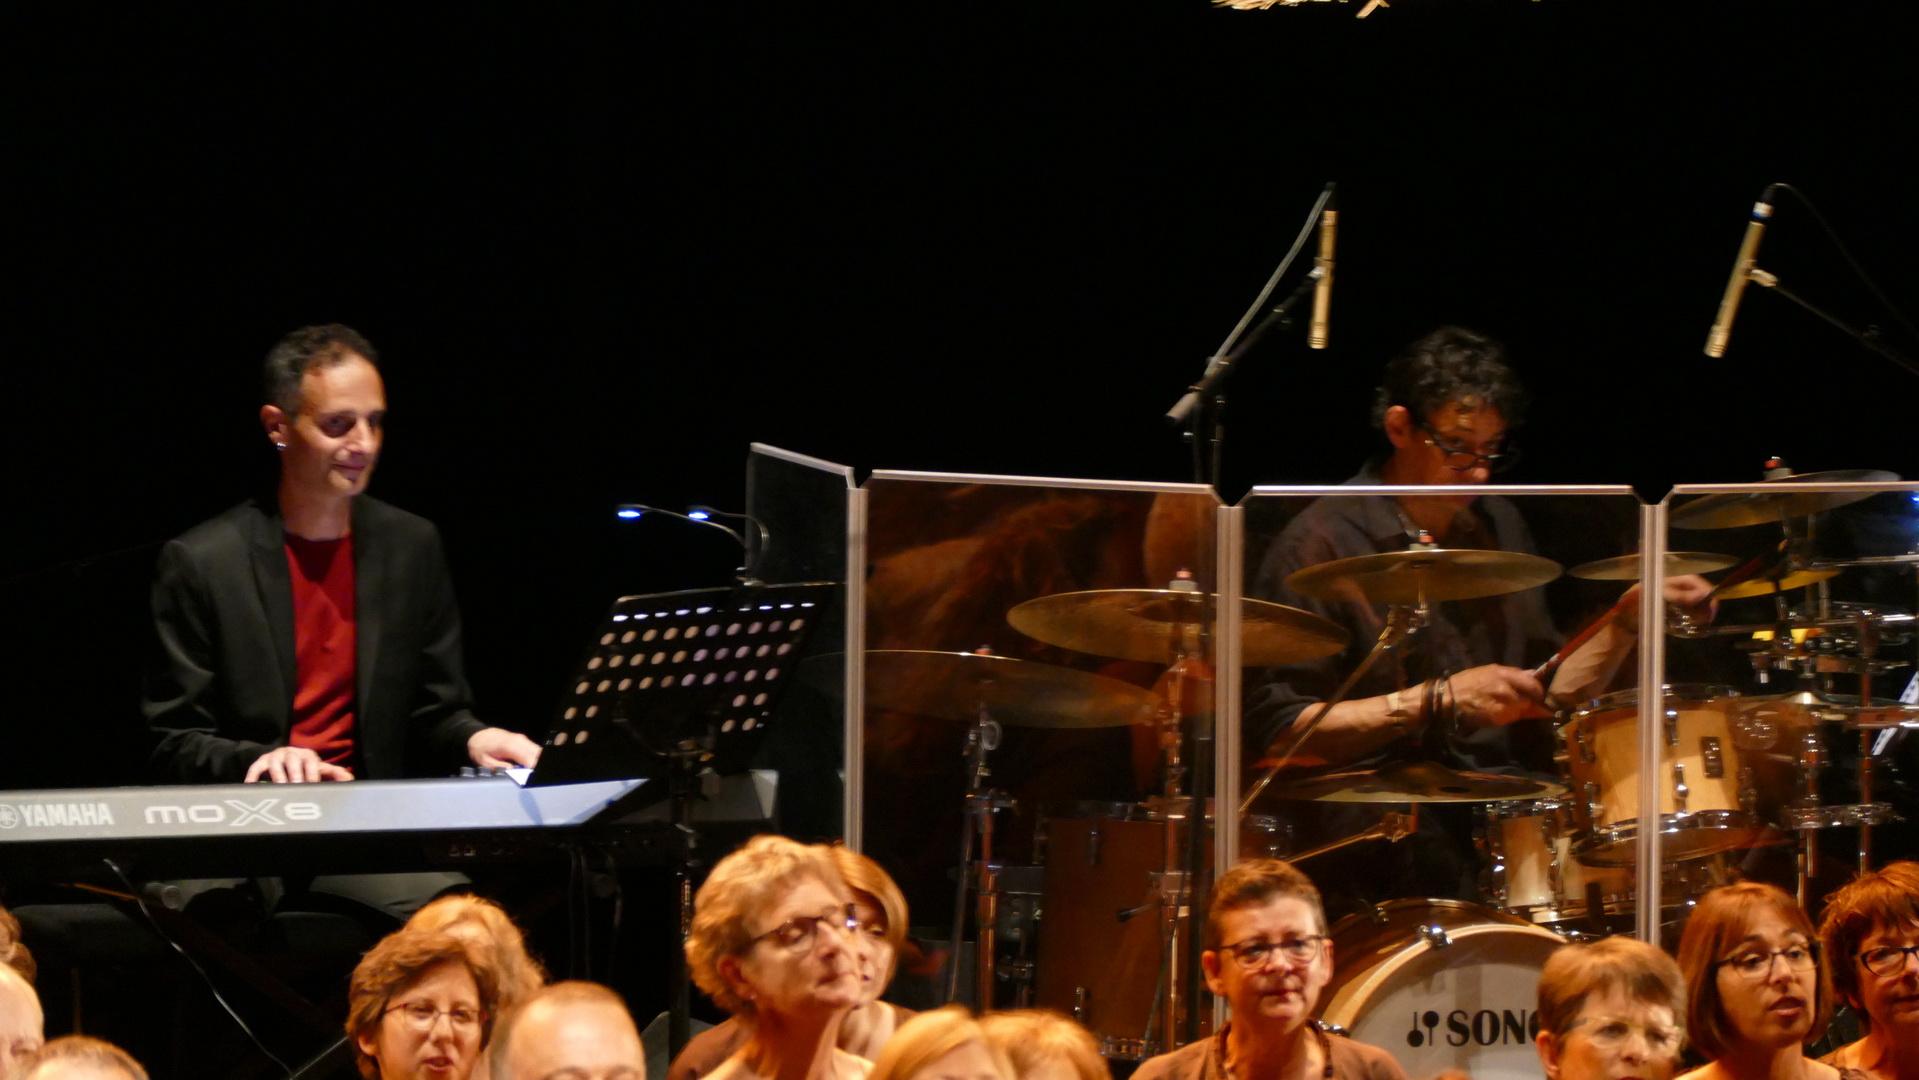 LFDS_concert_ailleurs (23)